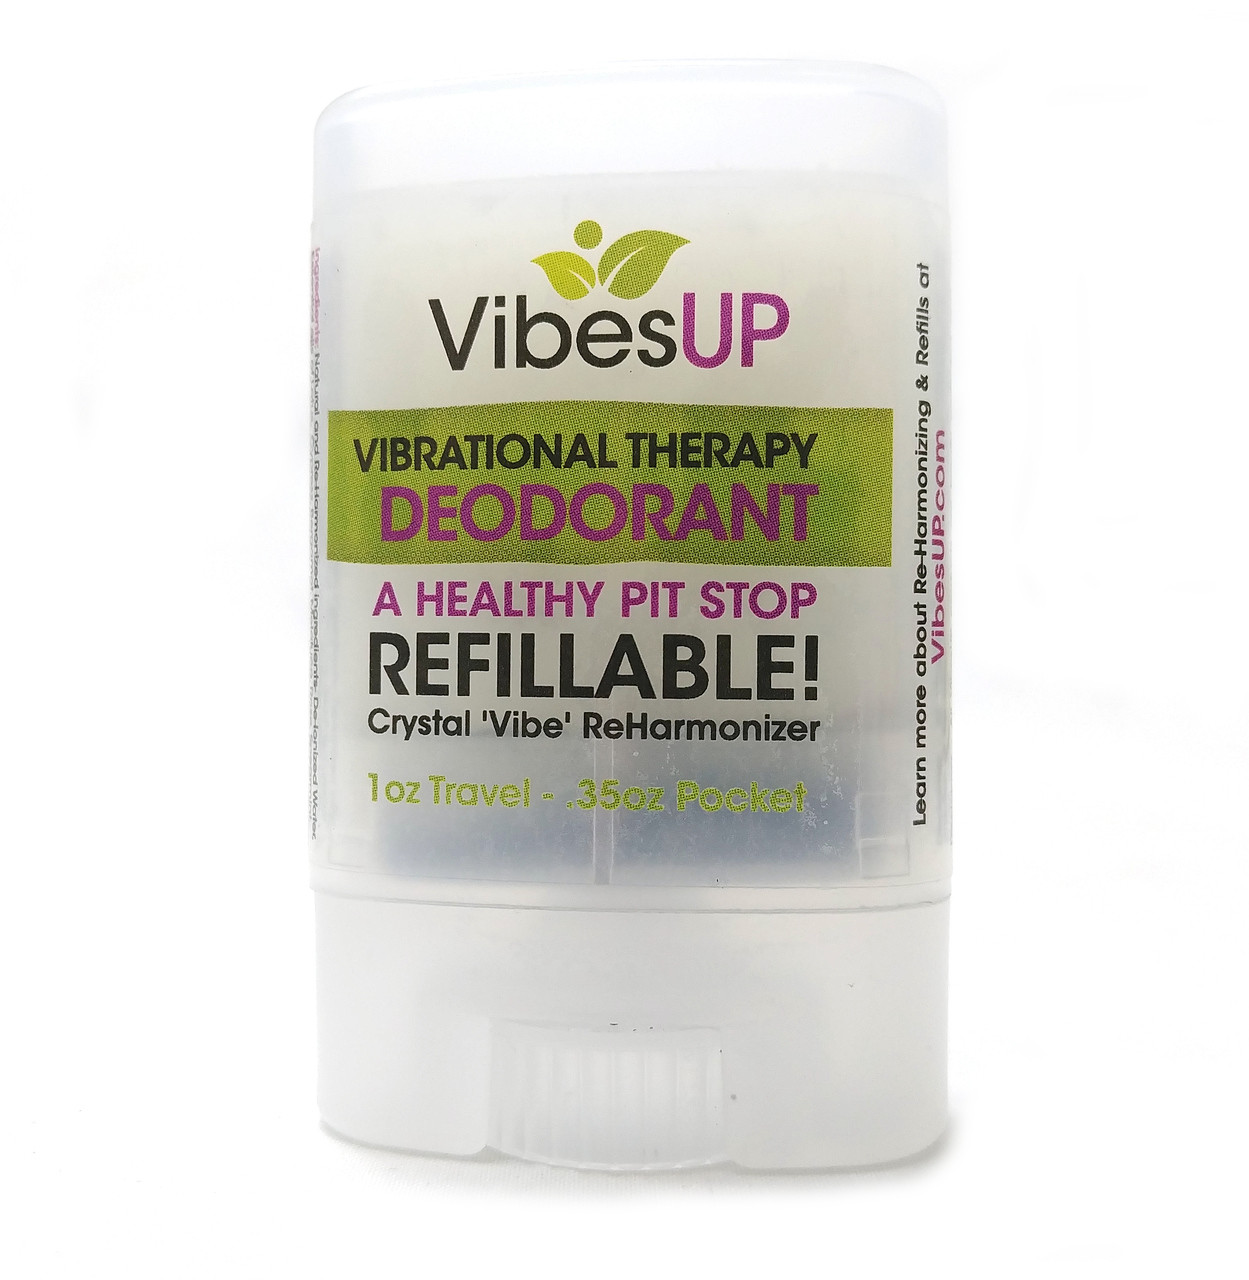 Pocket Size Vibe Deodorant